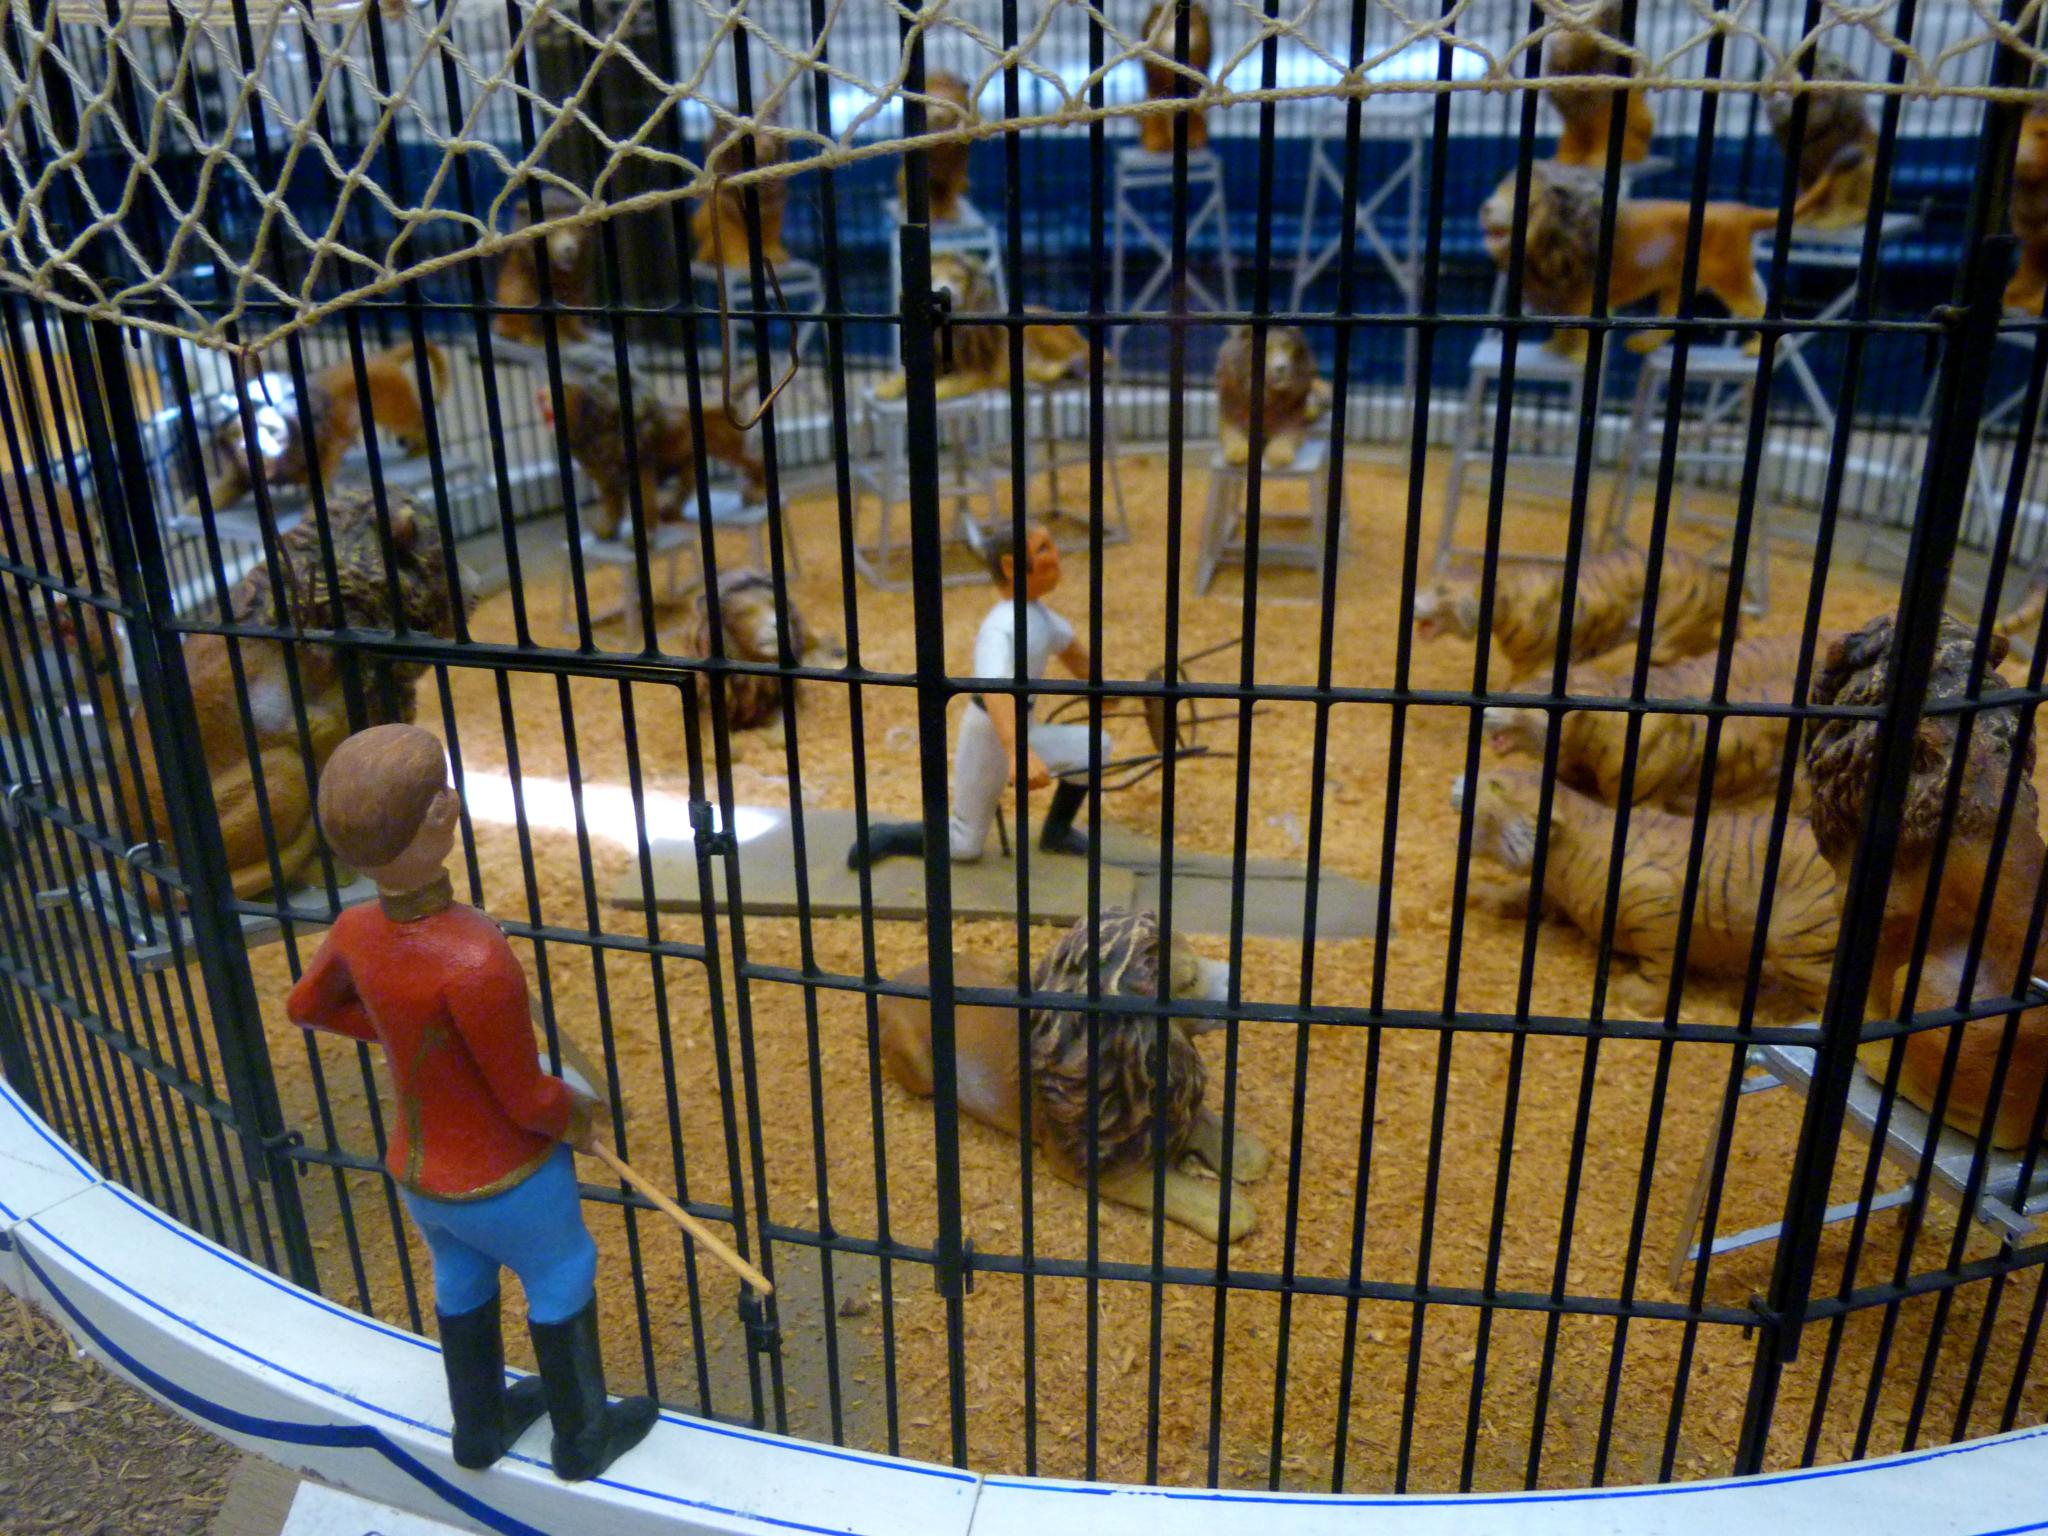 Miniature Circus Exhibit at Big E